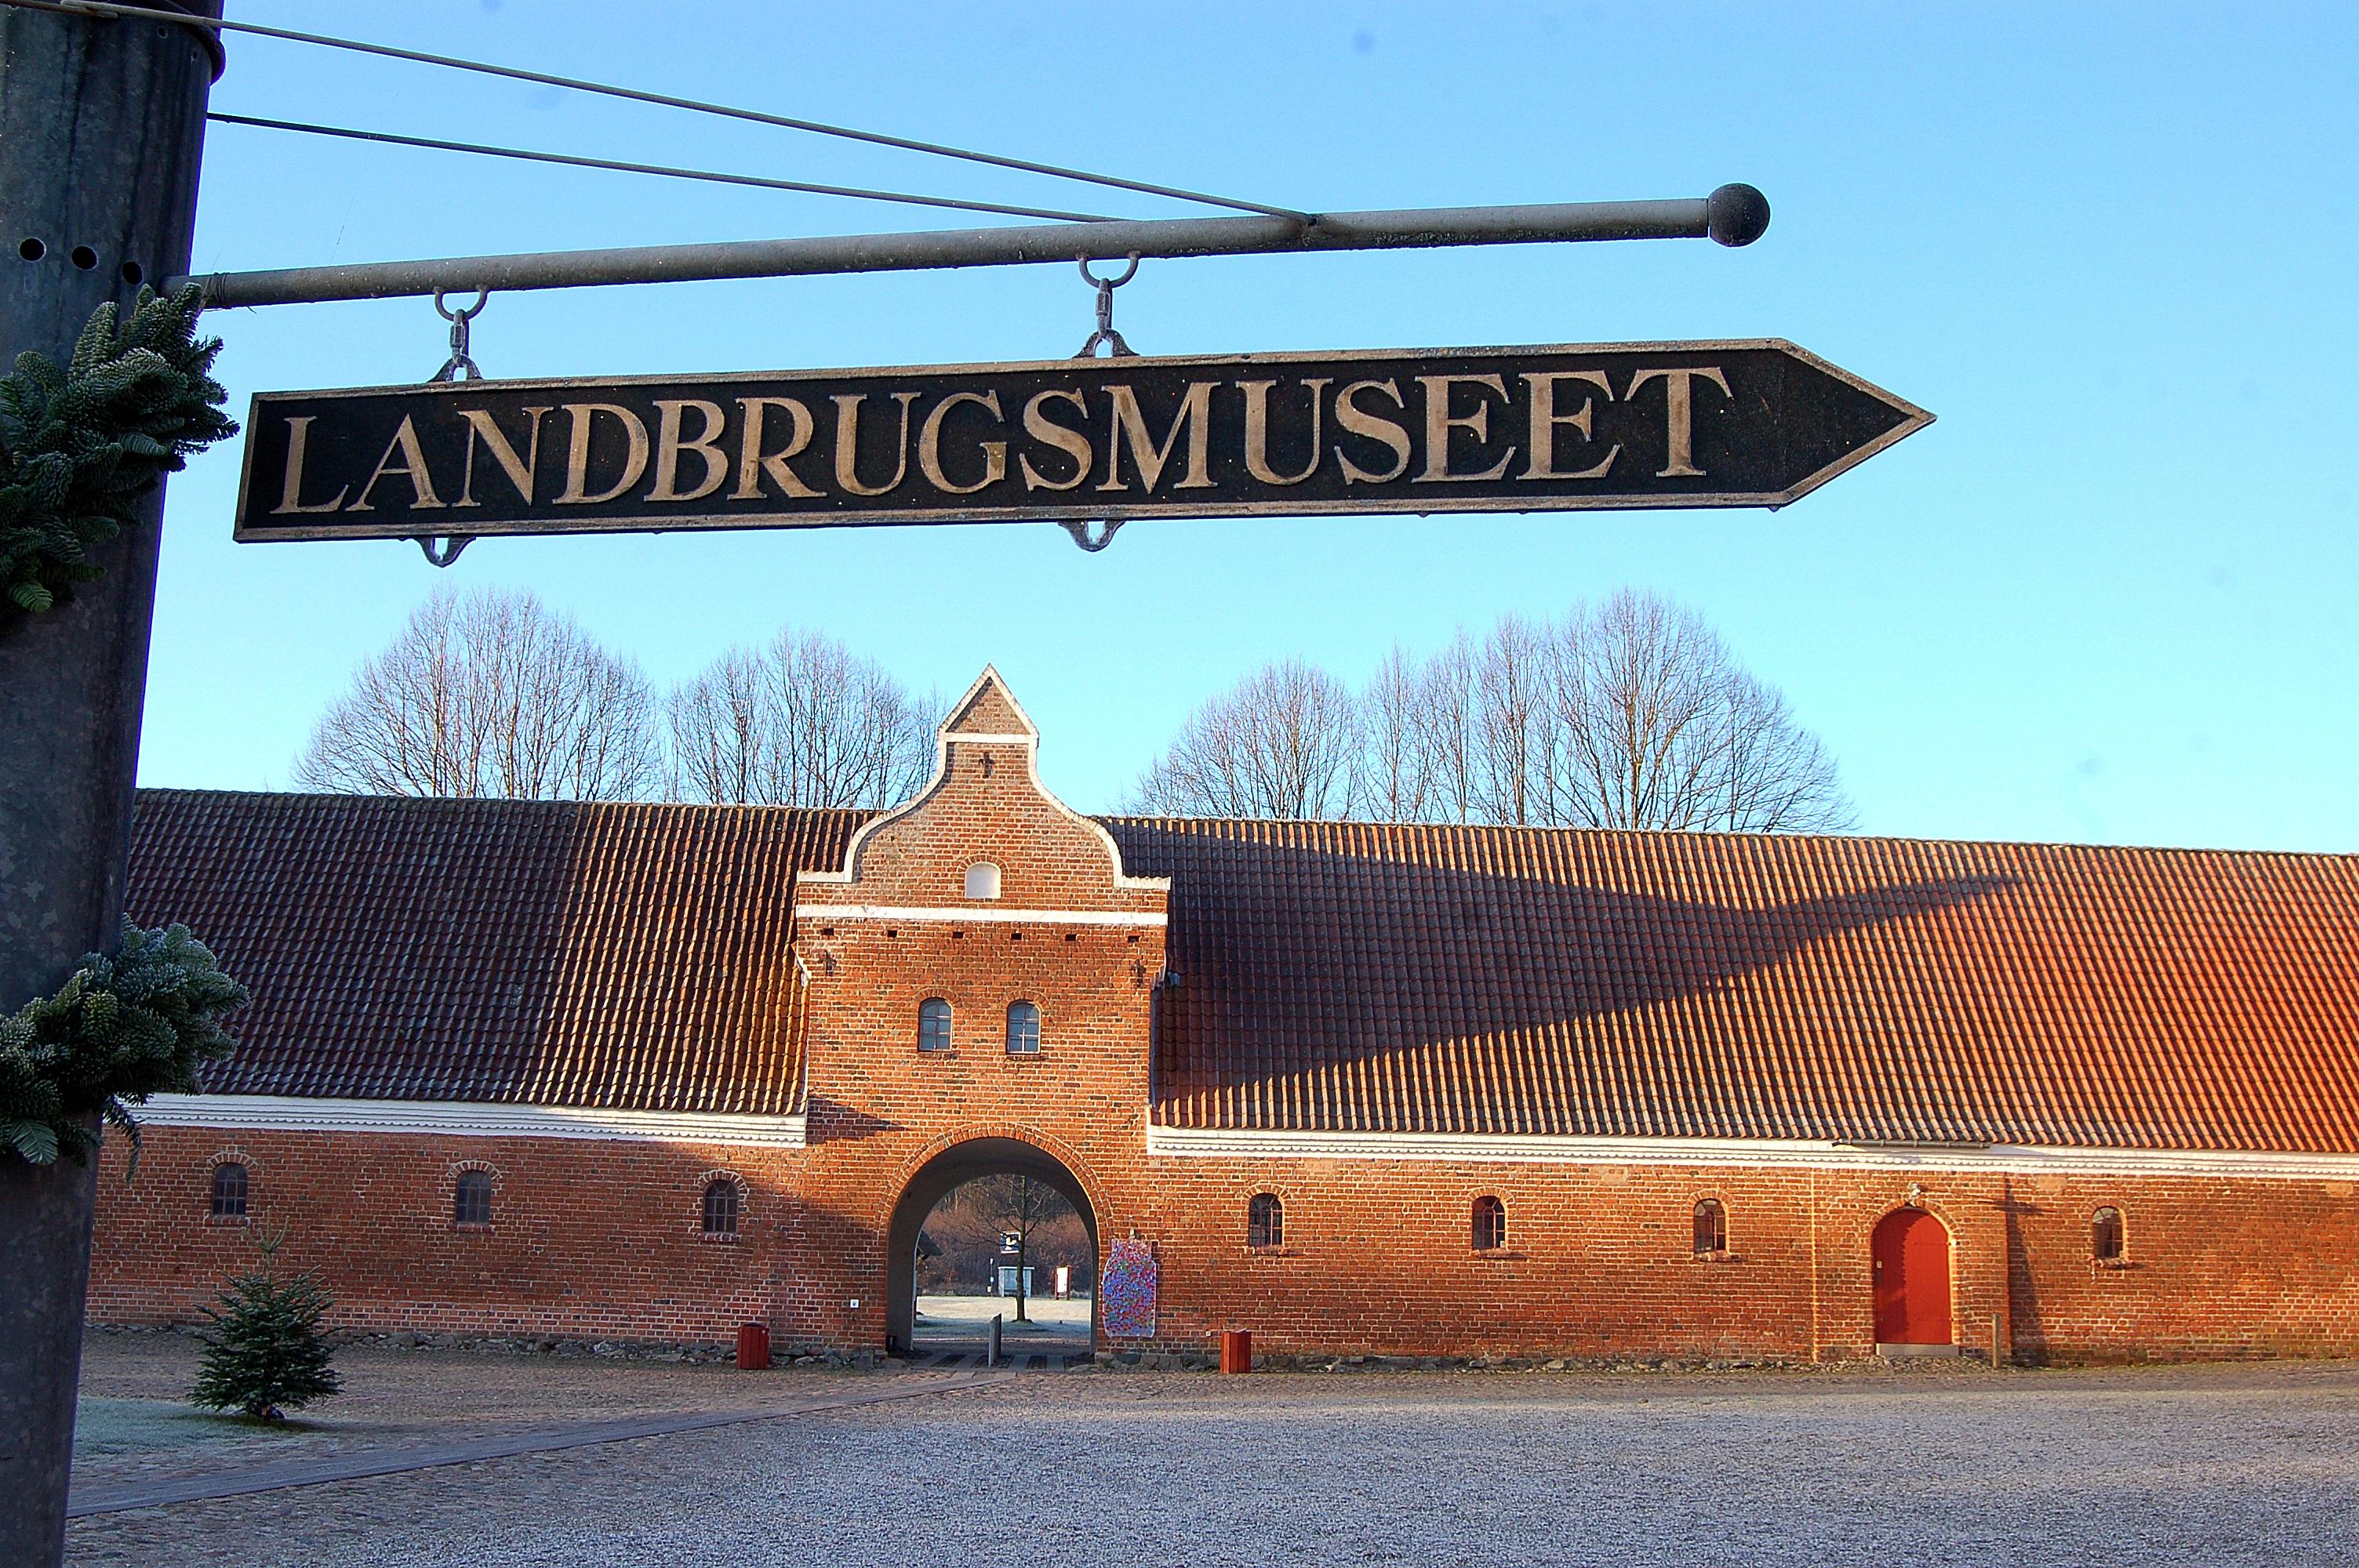 Landbrugsmuseet gl. estrup